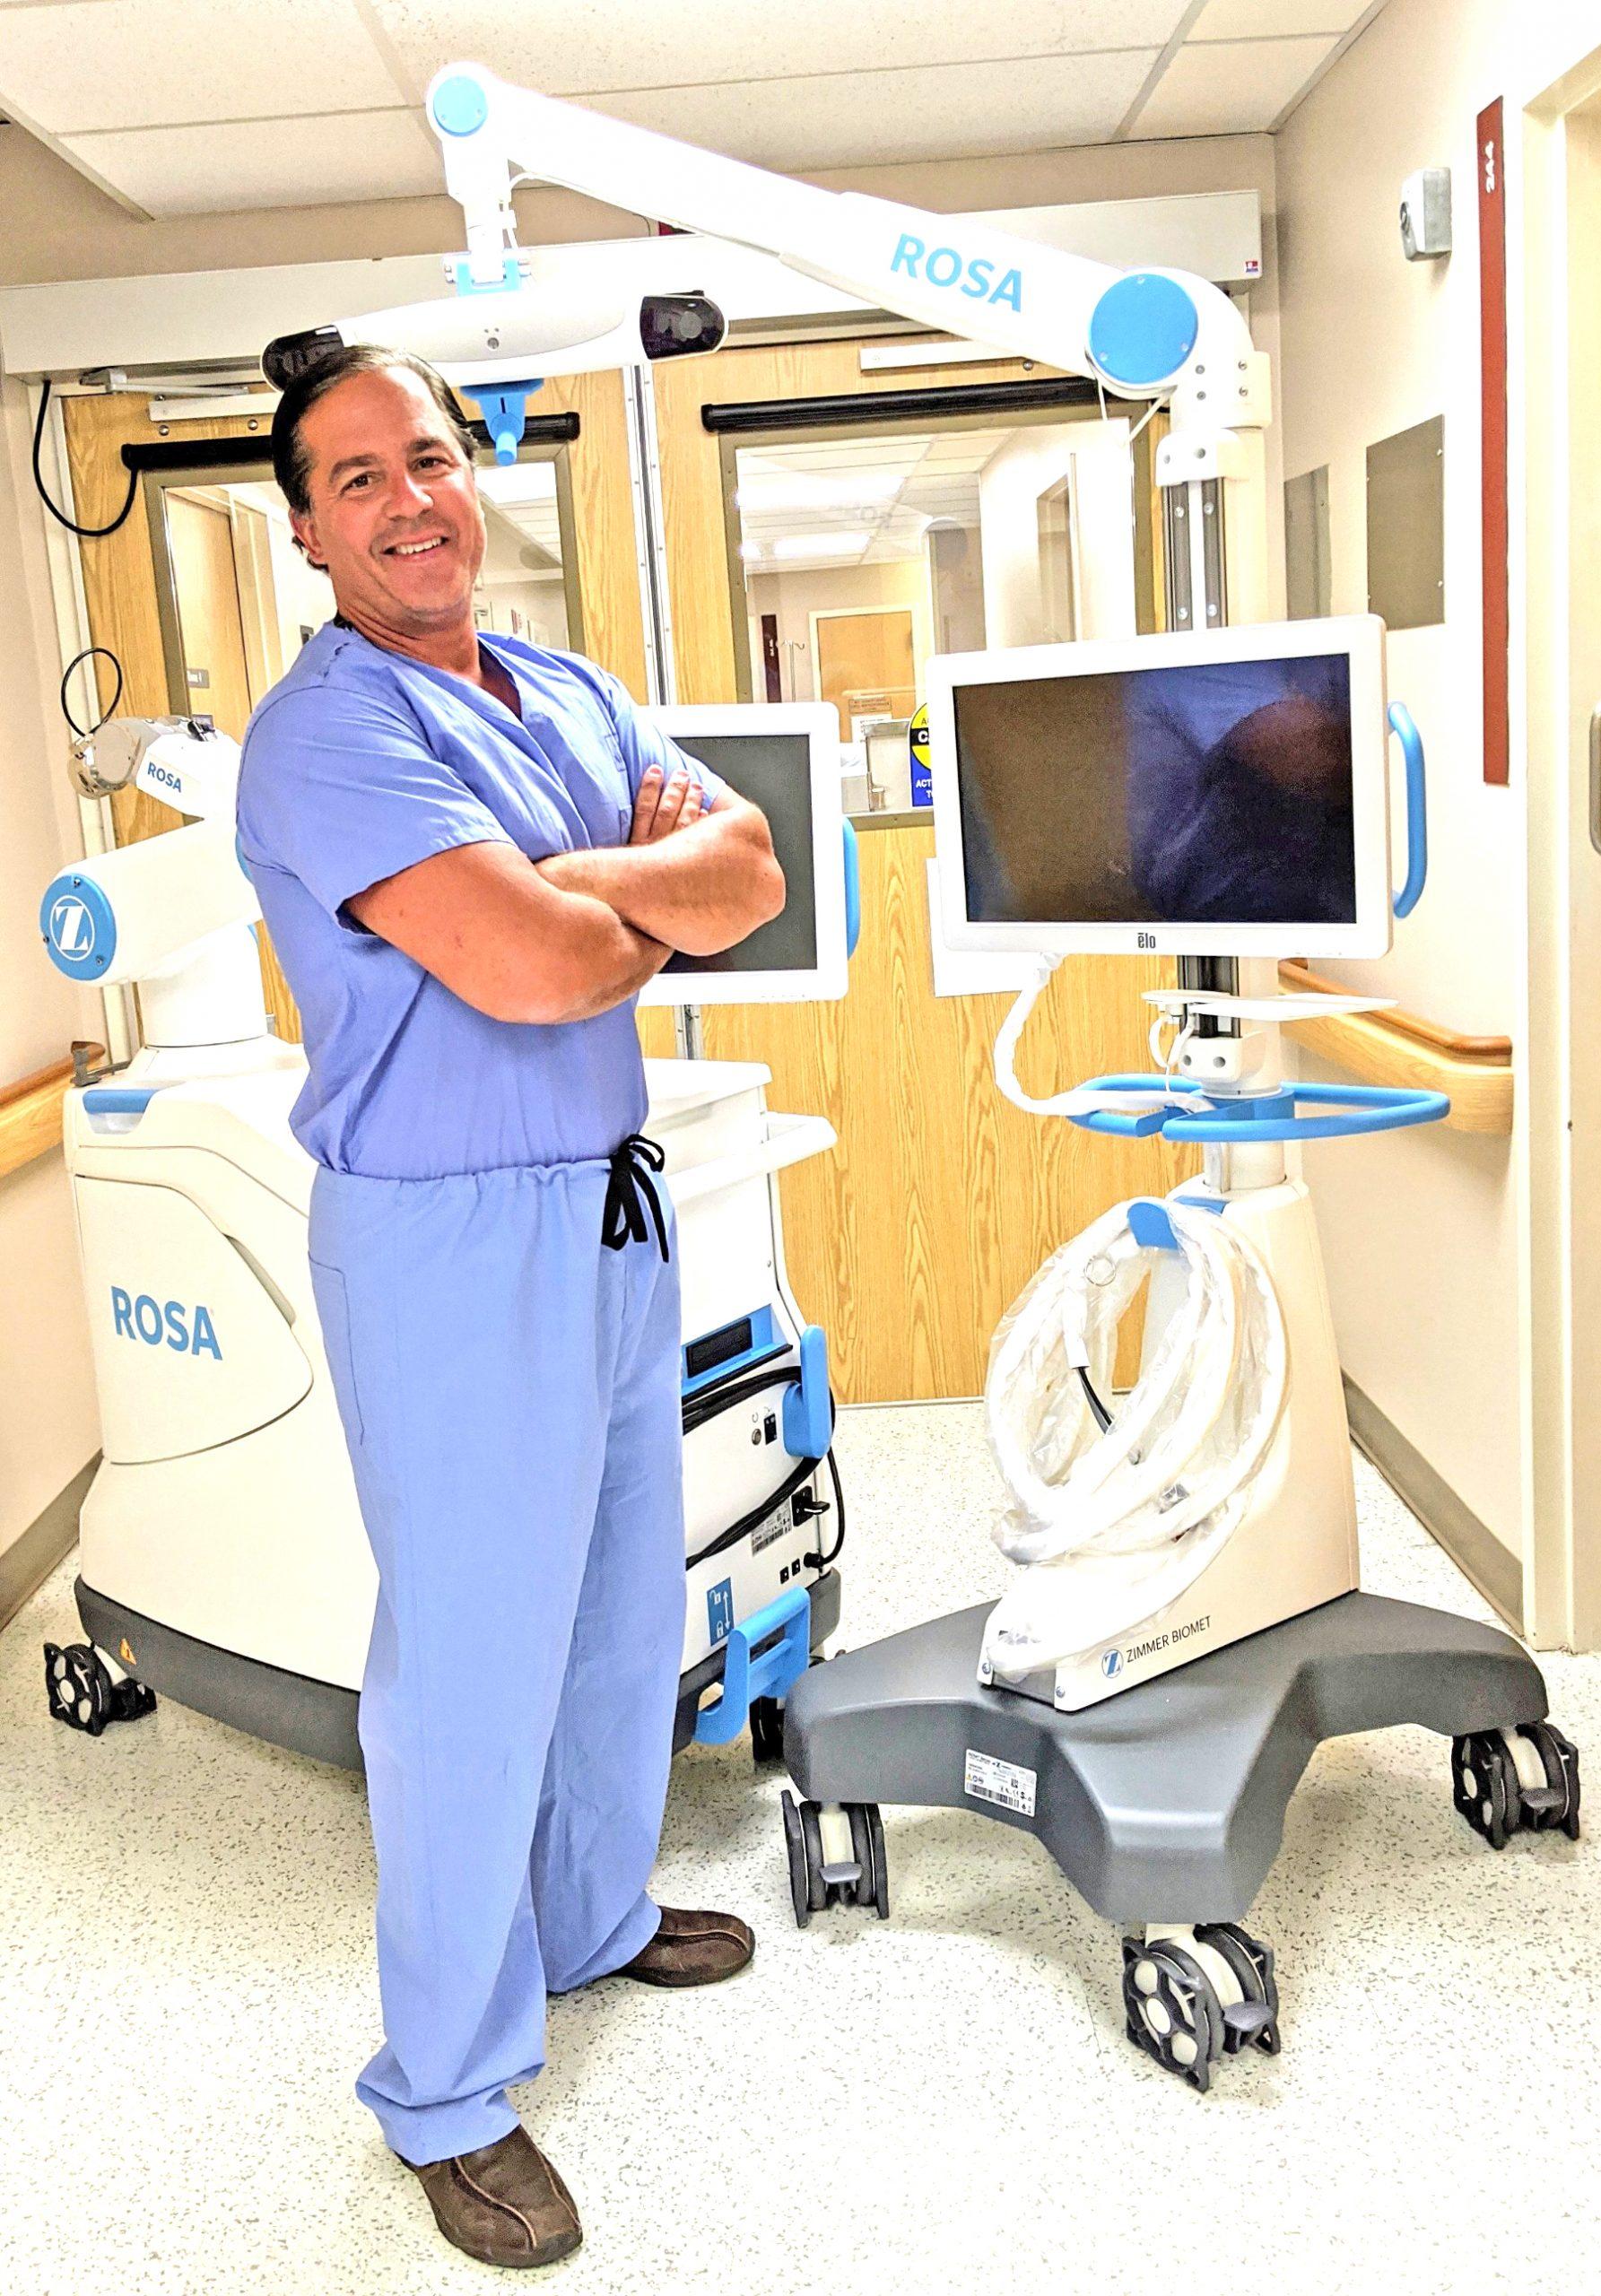 Newark-Wayne Doctor to perform robotic total knee replacement - The Times  of Wayne County - Waynetimes.com